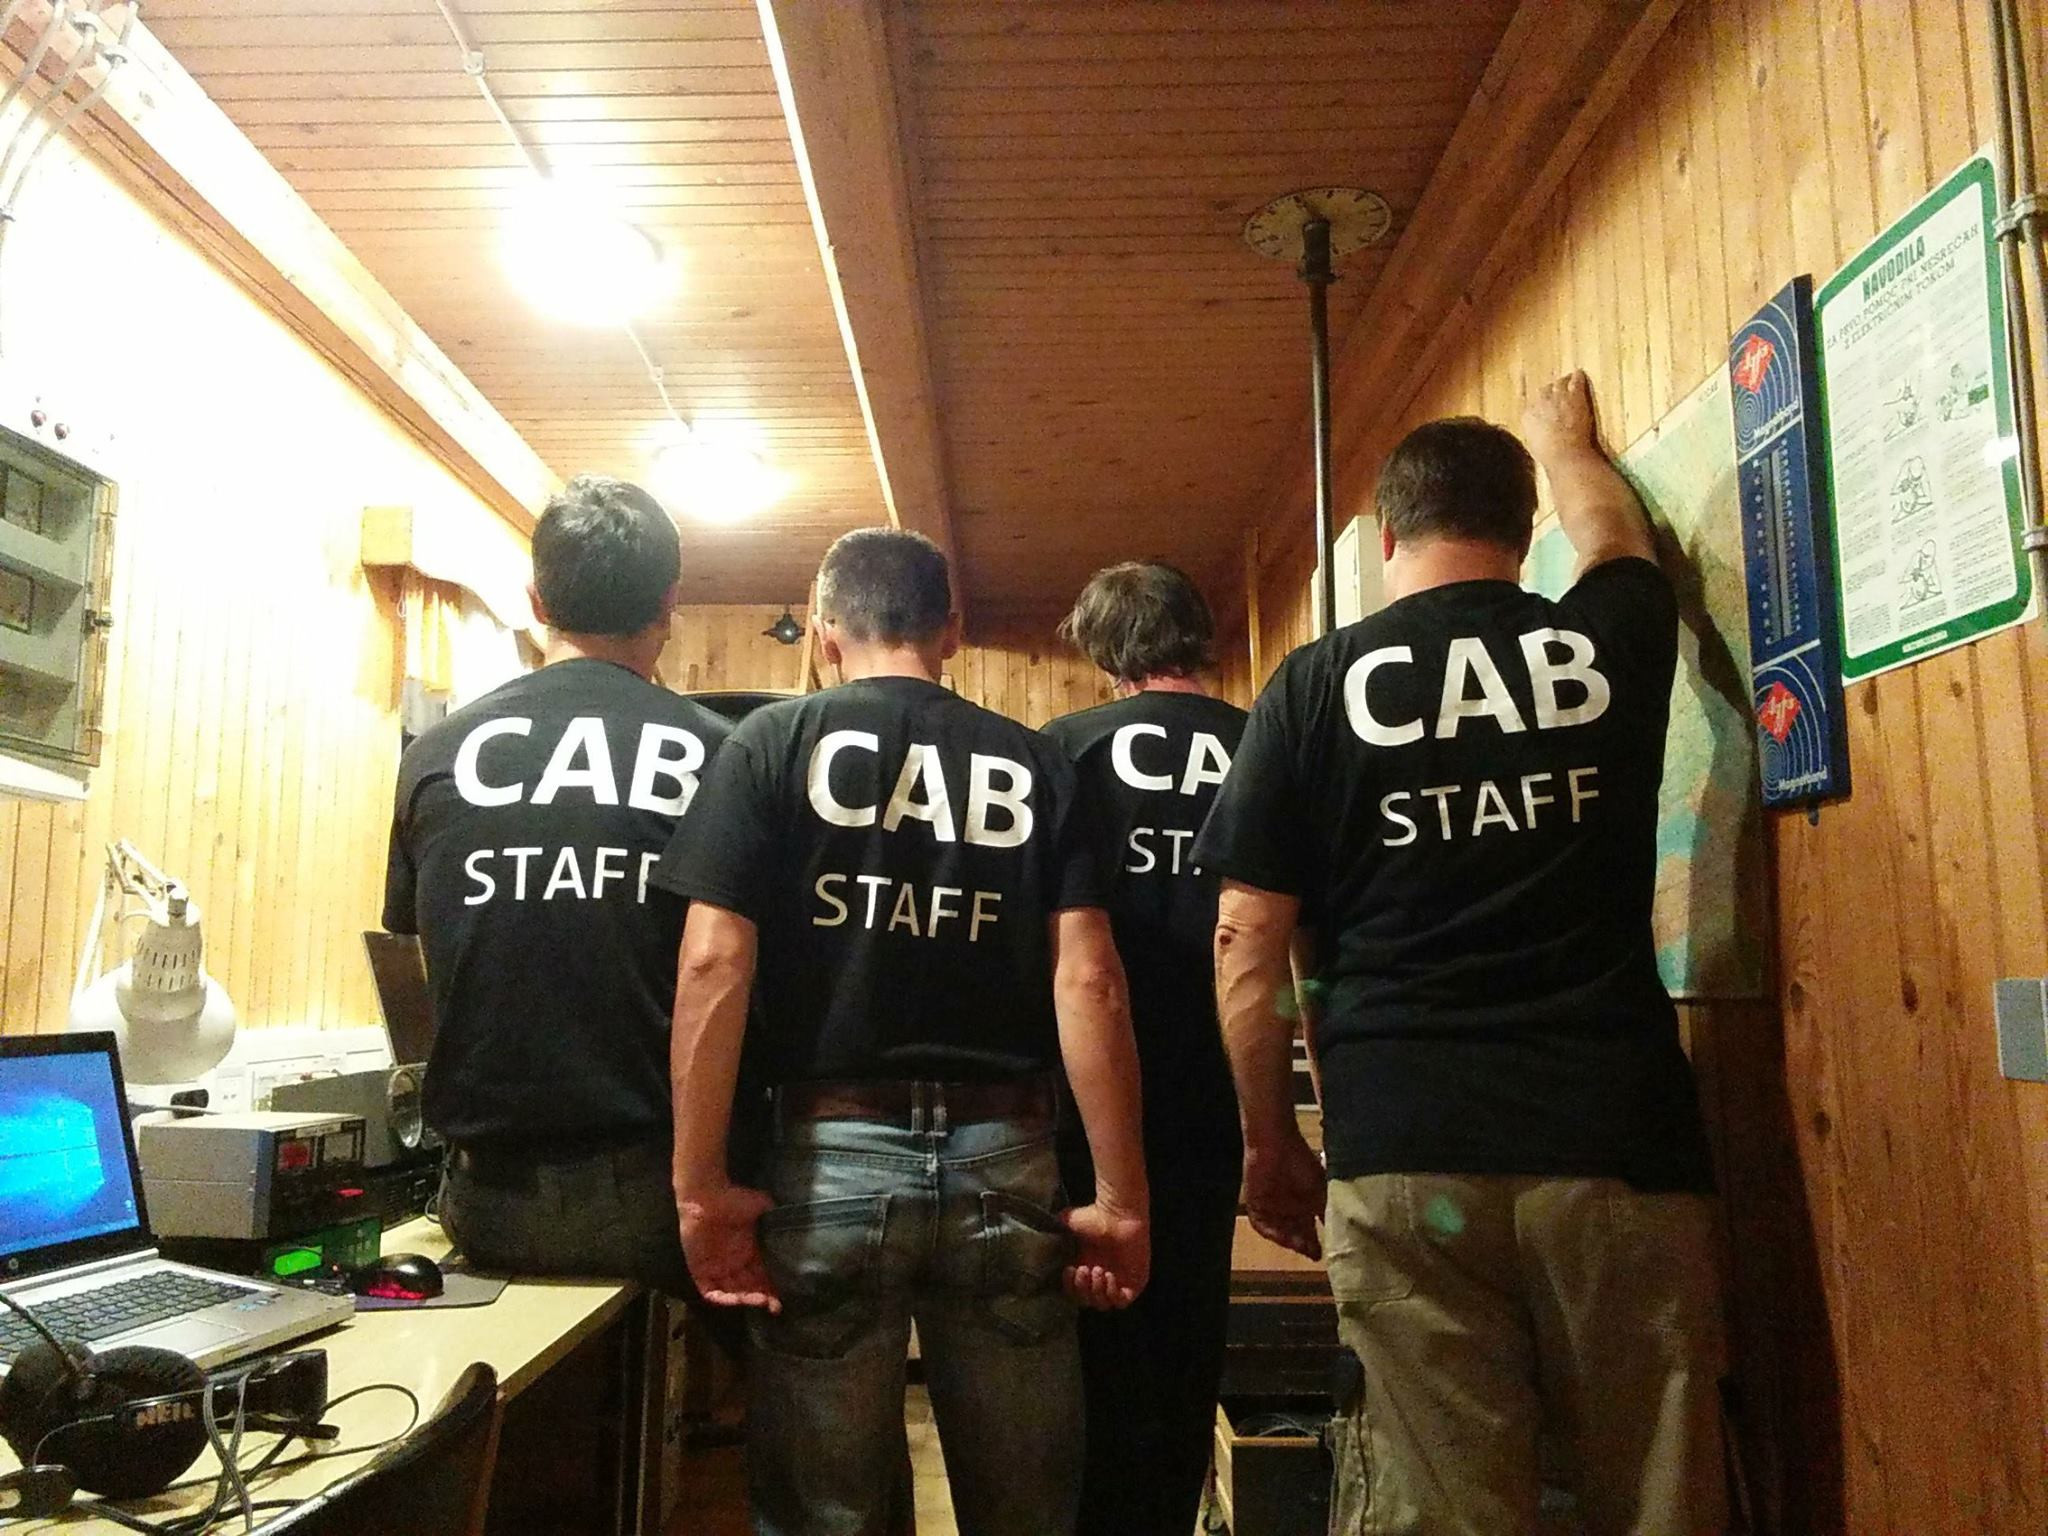 cab1-1.jpg